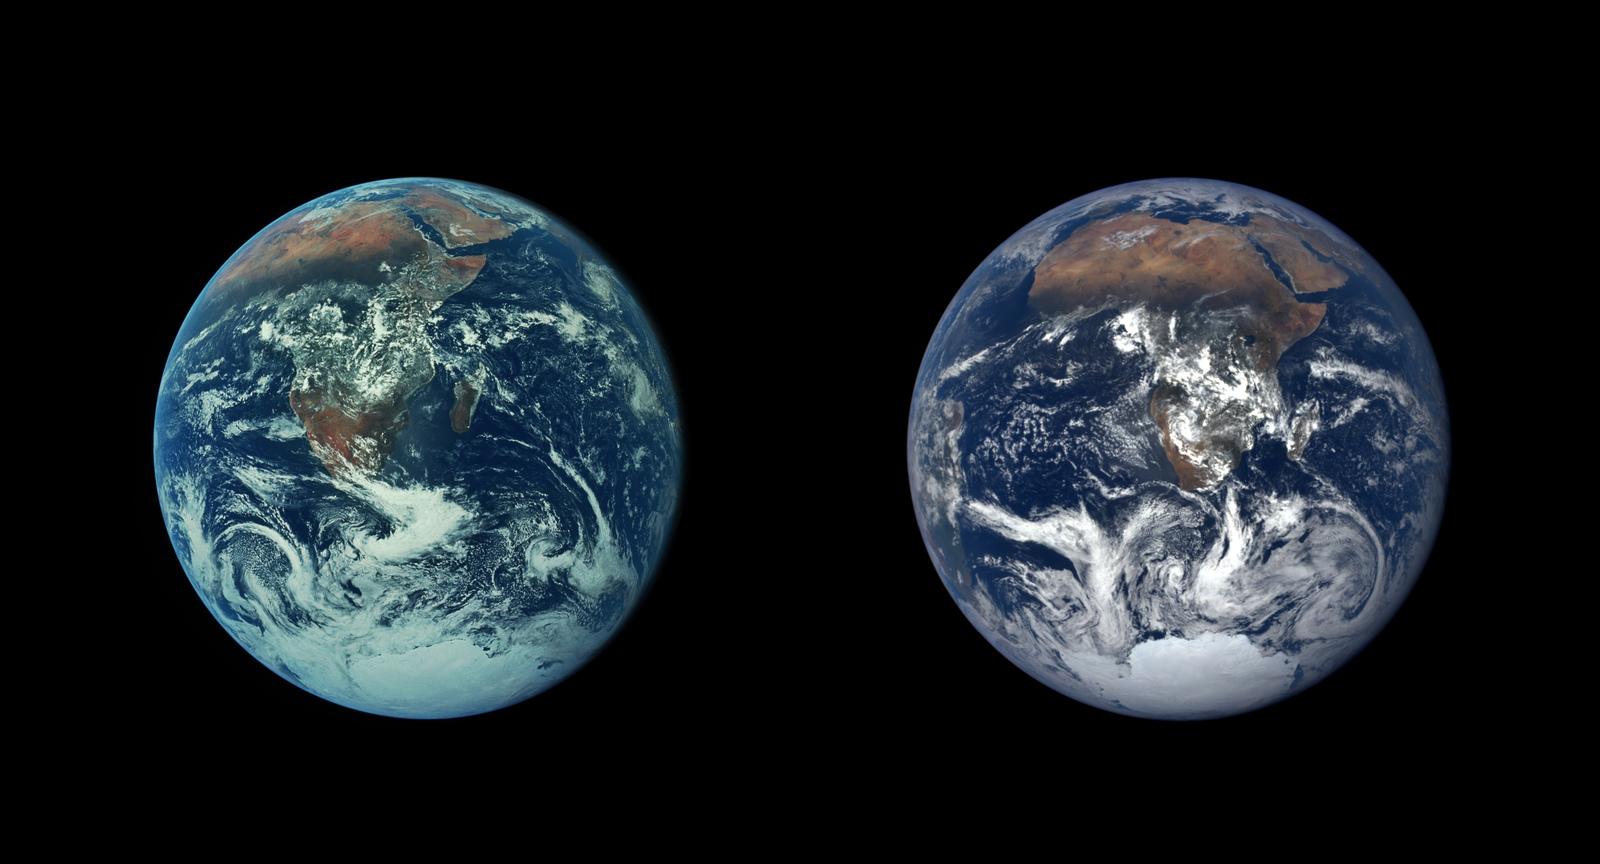 земля. фото с космоса